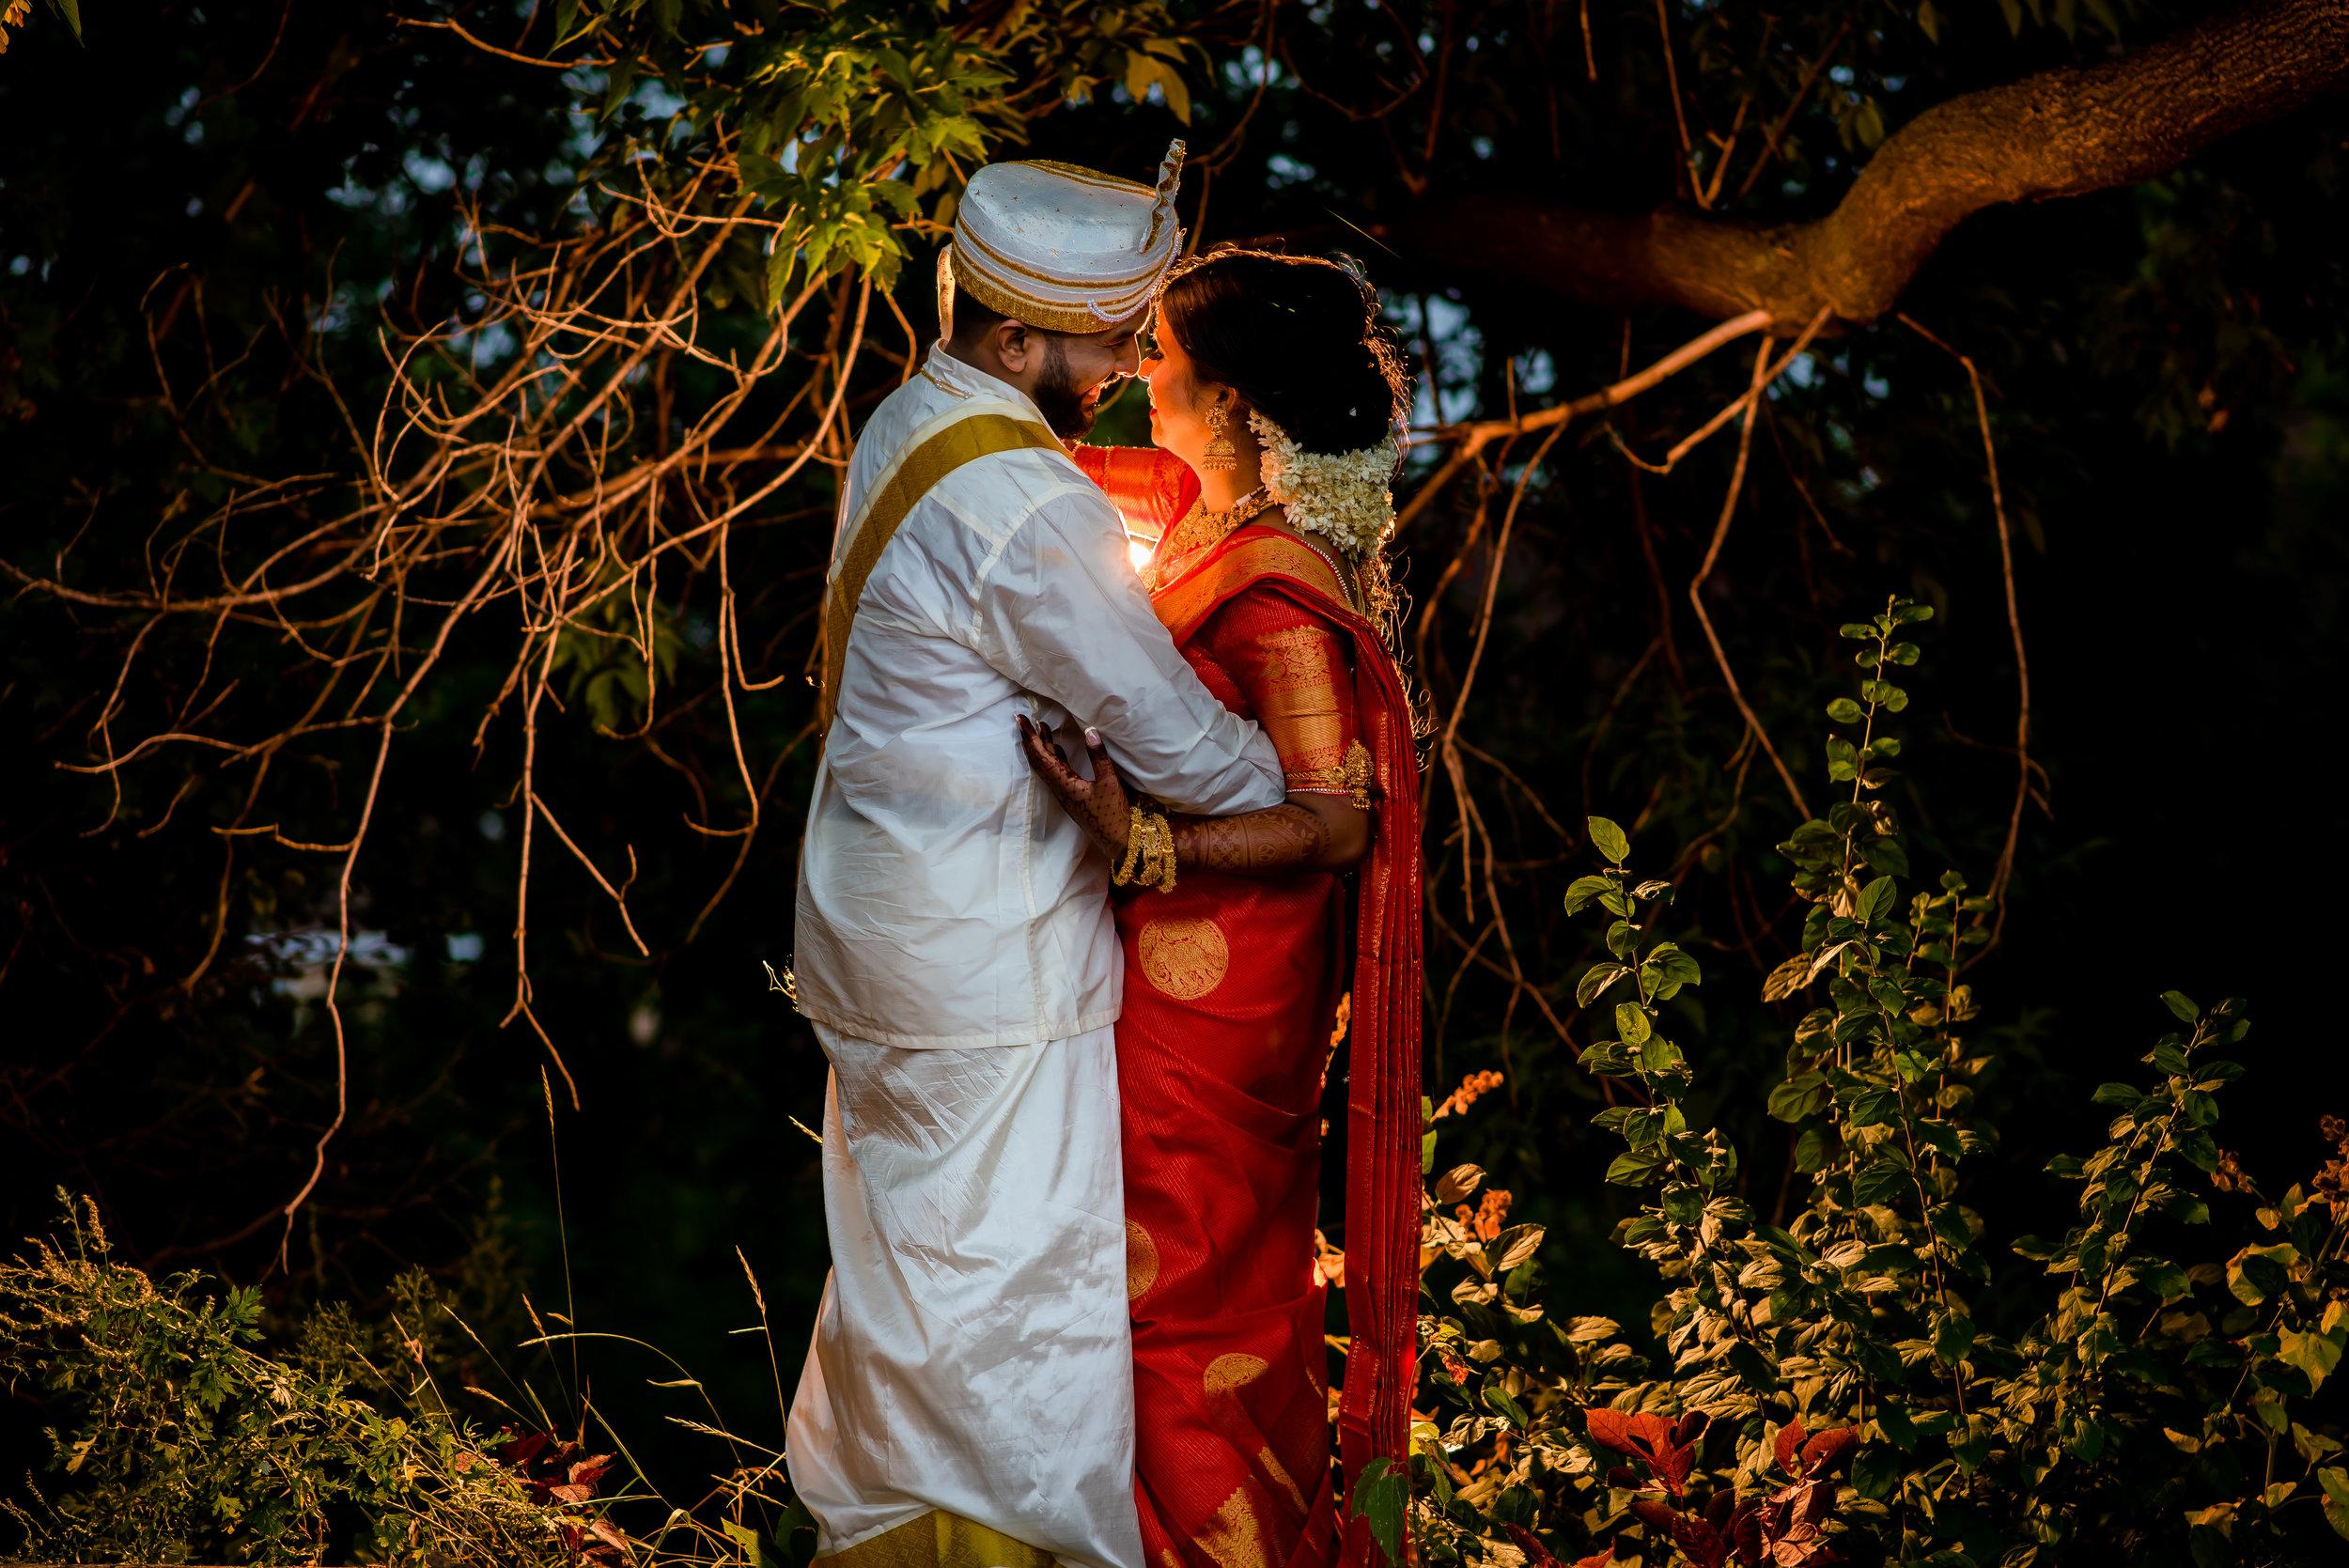 FULLRES_Nivetha&Mathi(Wedding) (1 of 1).JPG